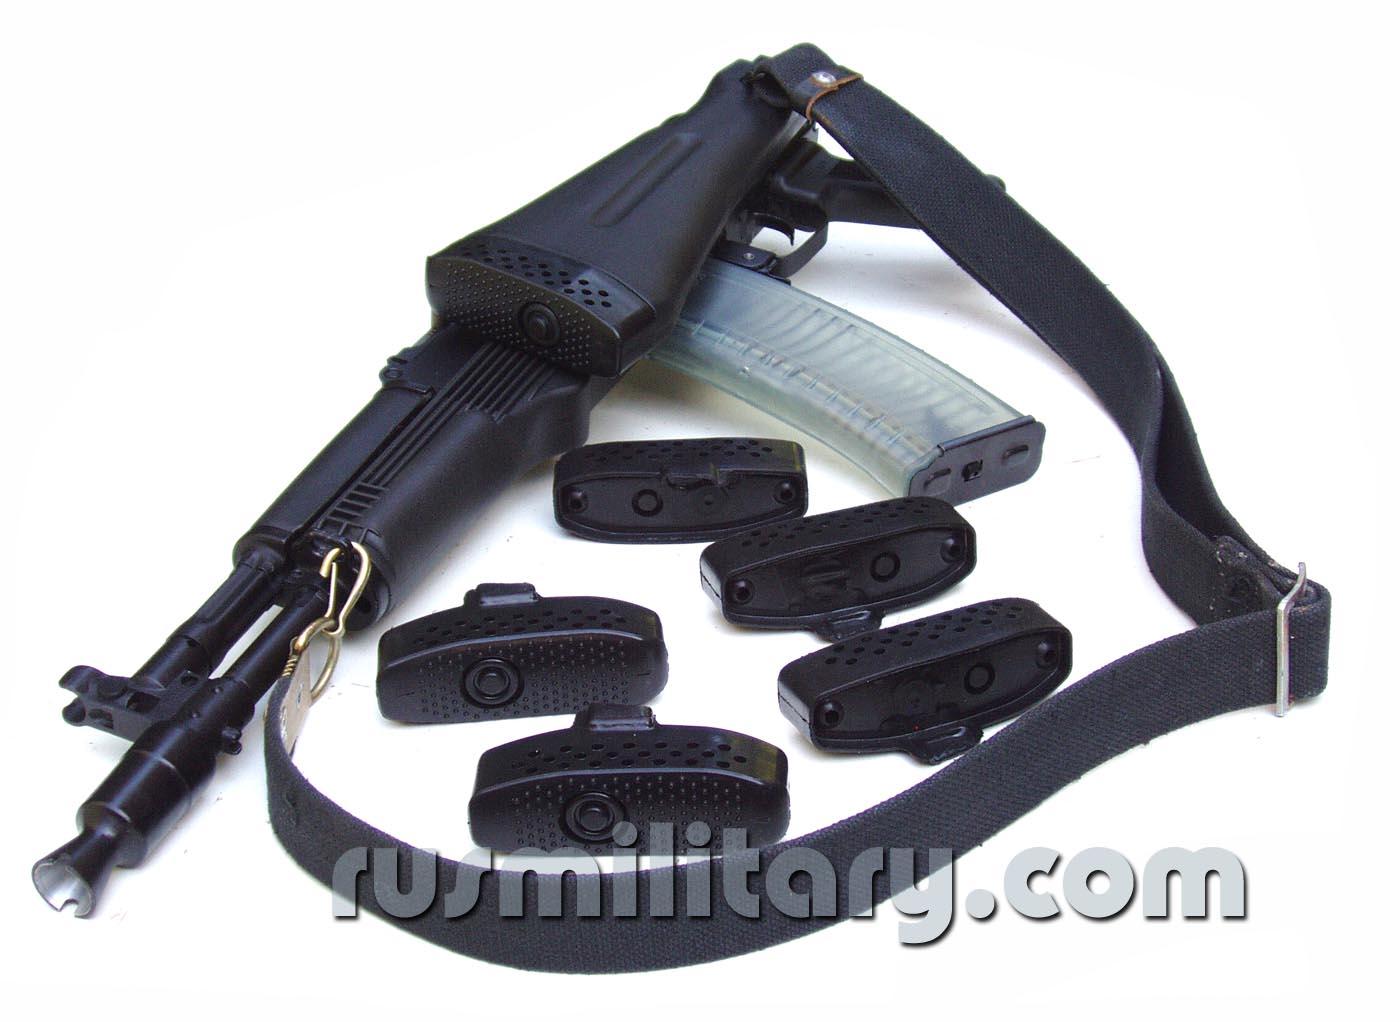 Soviet AK slings dropcases pouches